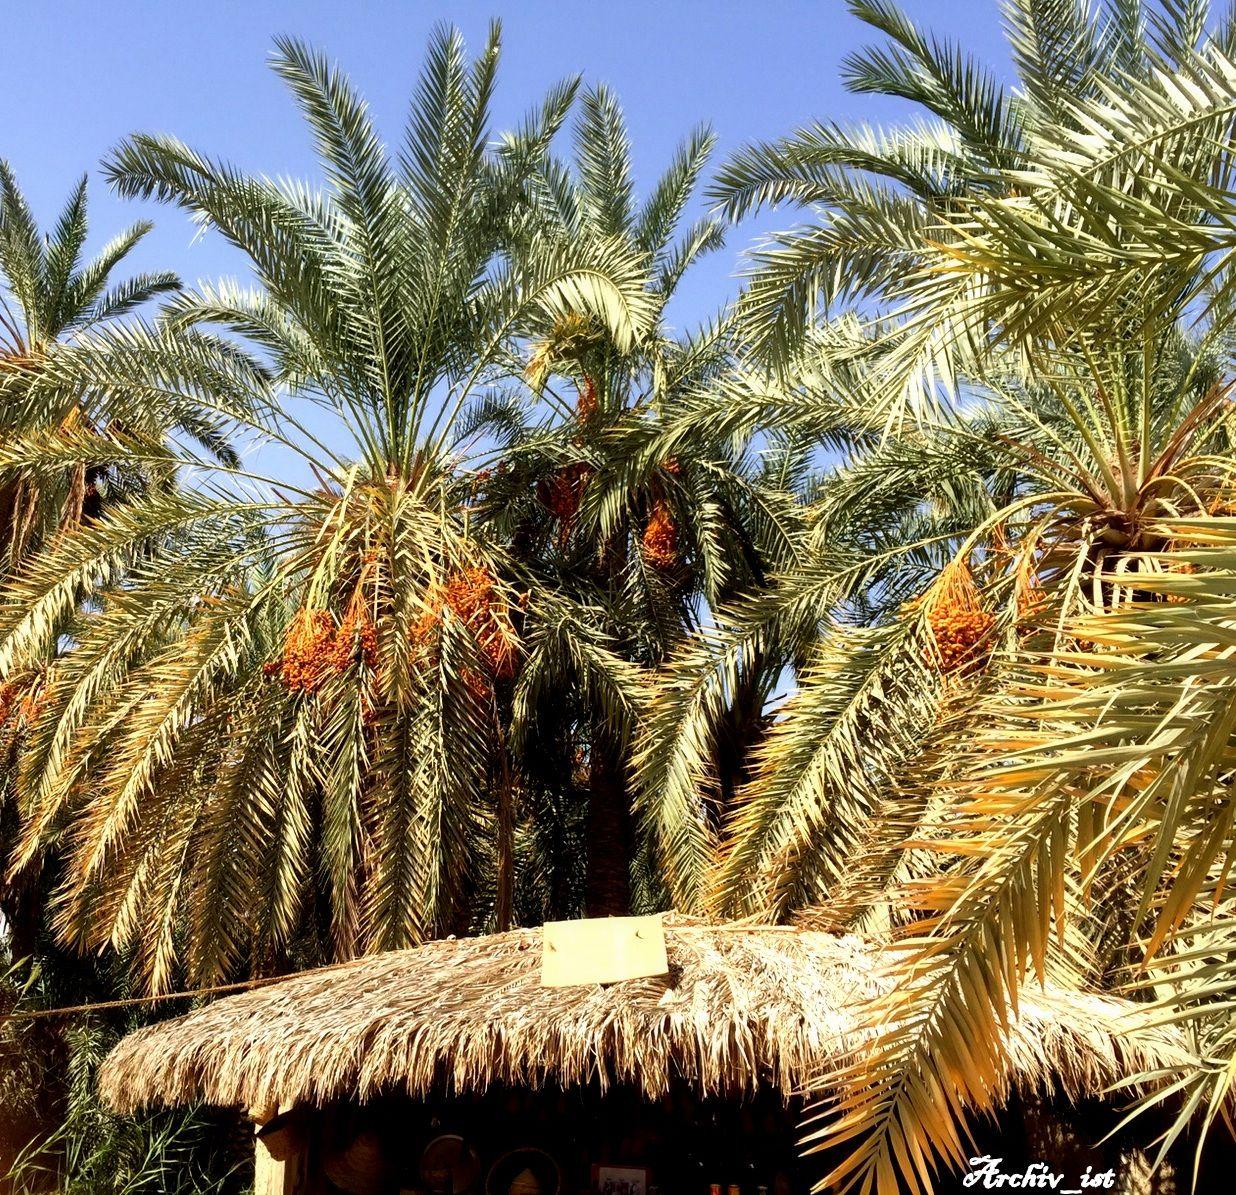 نخيل البلح في واحة سيوه Siwa Oasis Handmade Amazigh Morning Colorful Siwa Oasis Story Inspiration My Muse